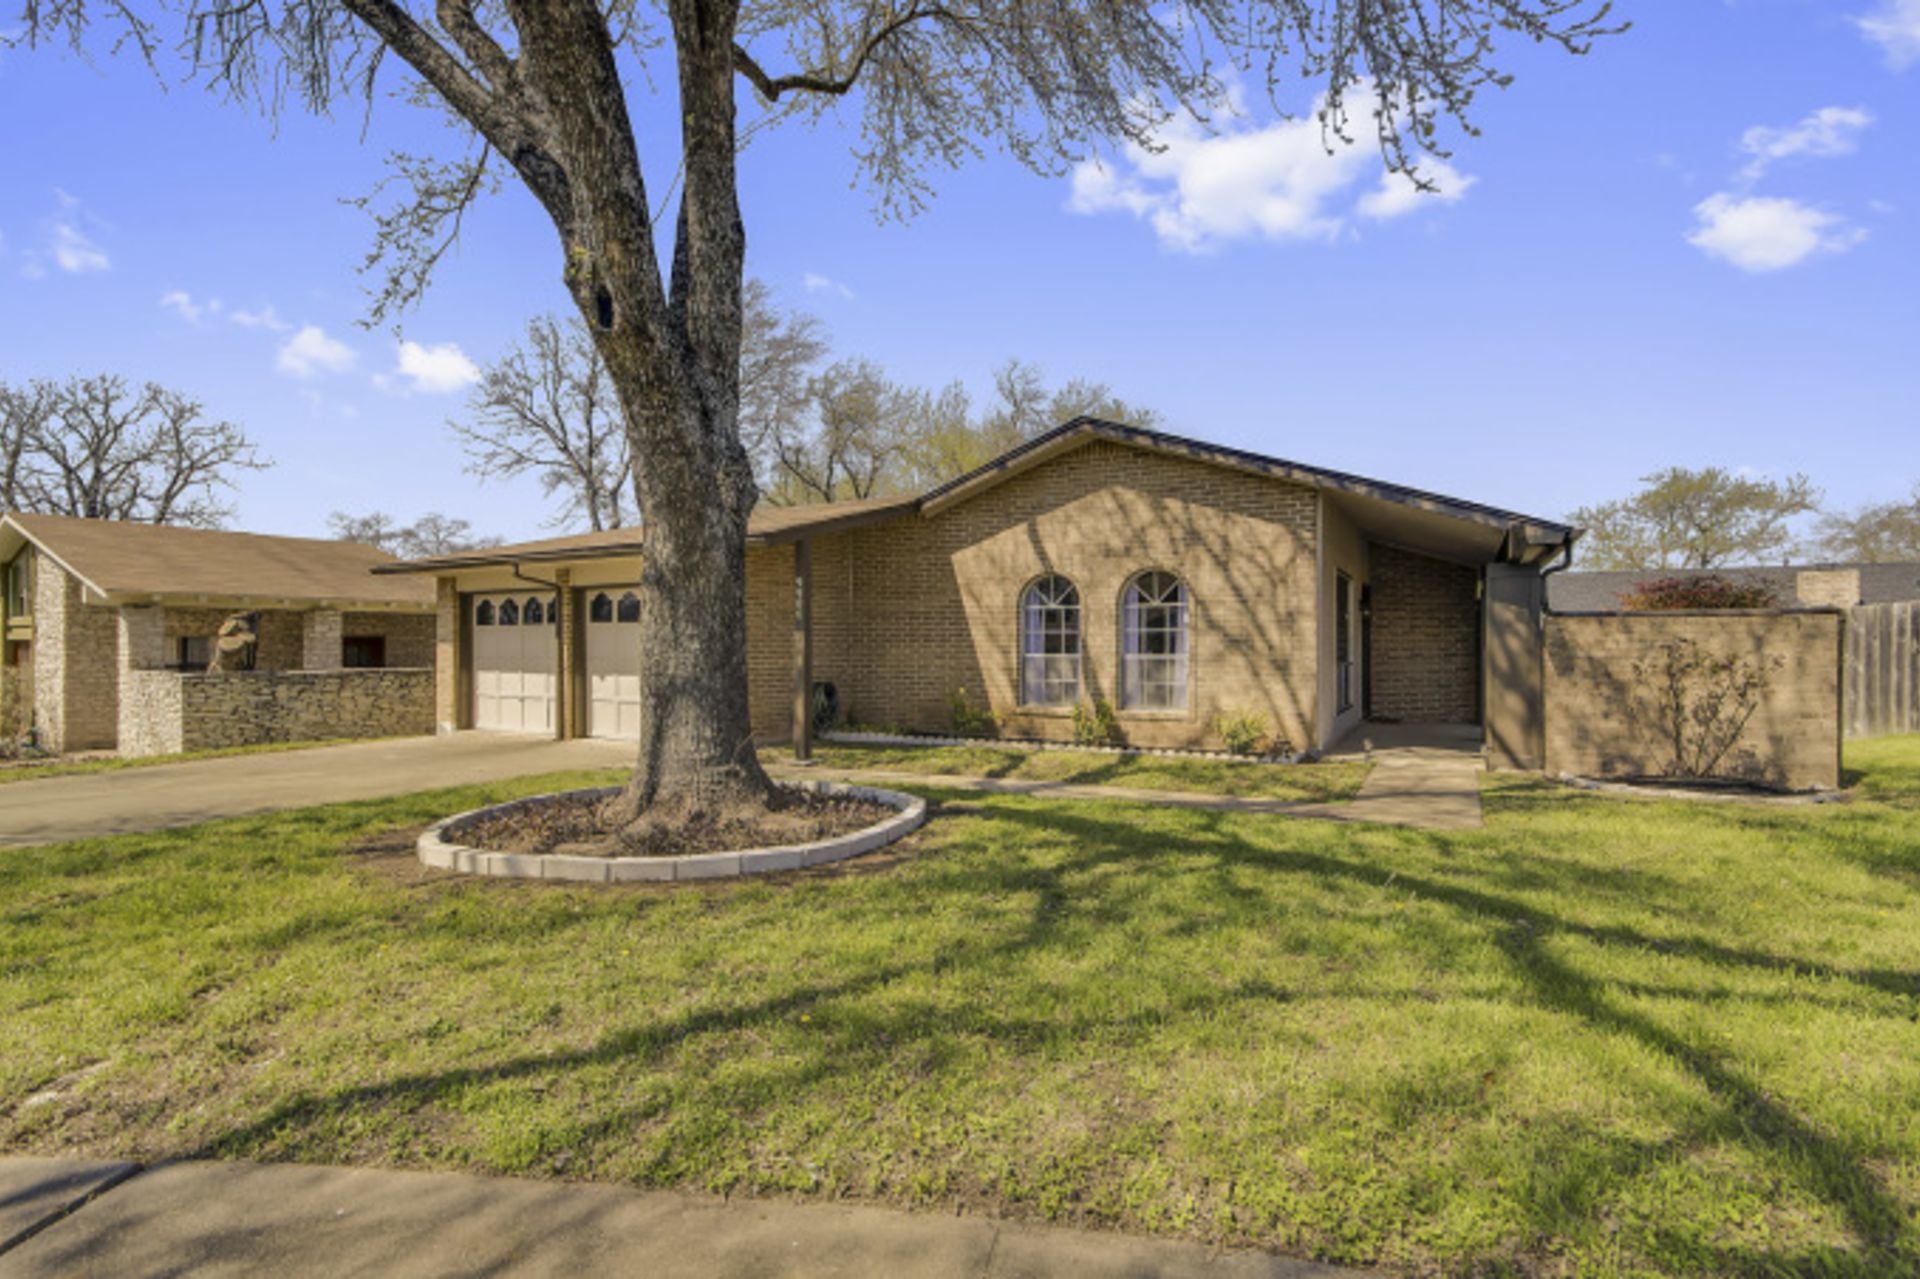 9906 Chukar Bend, Austin, TX 78758 – North Austin Classic